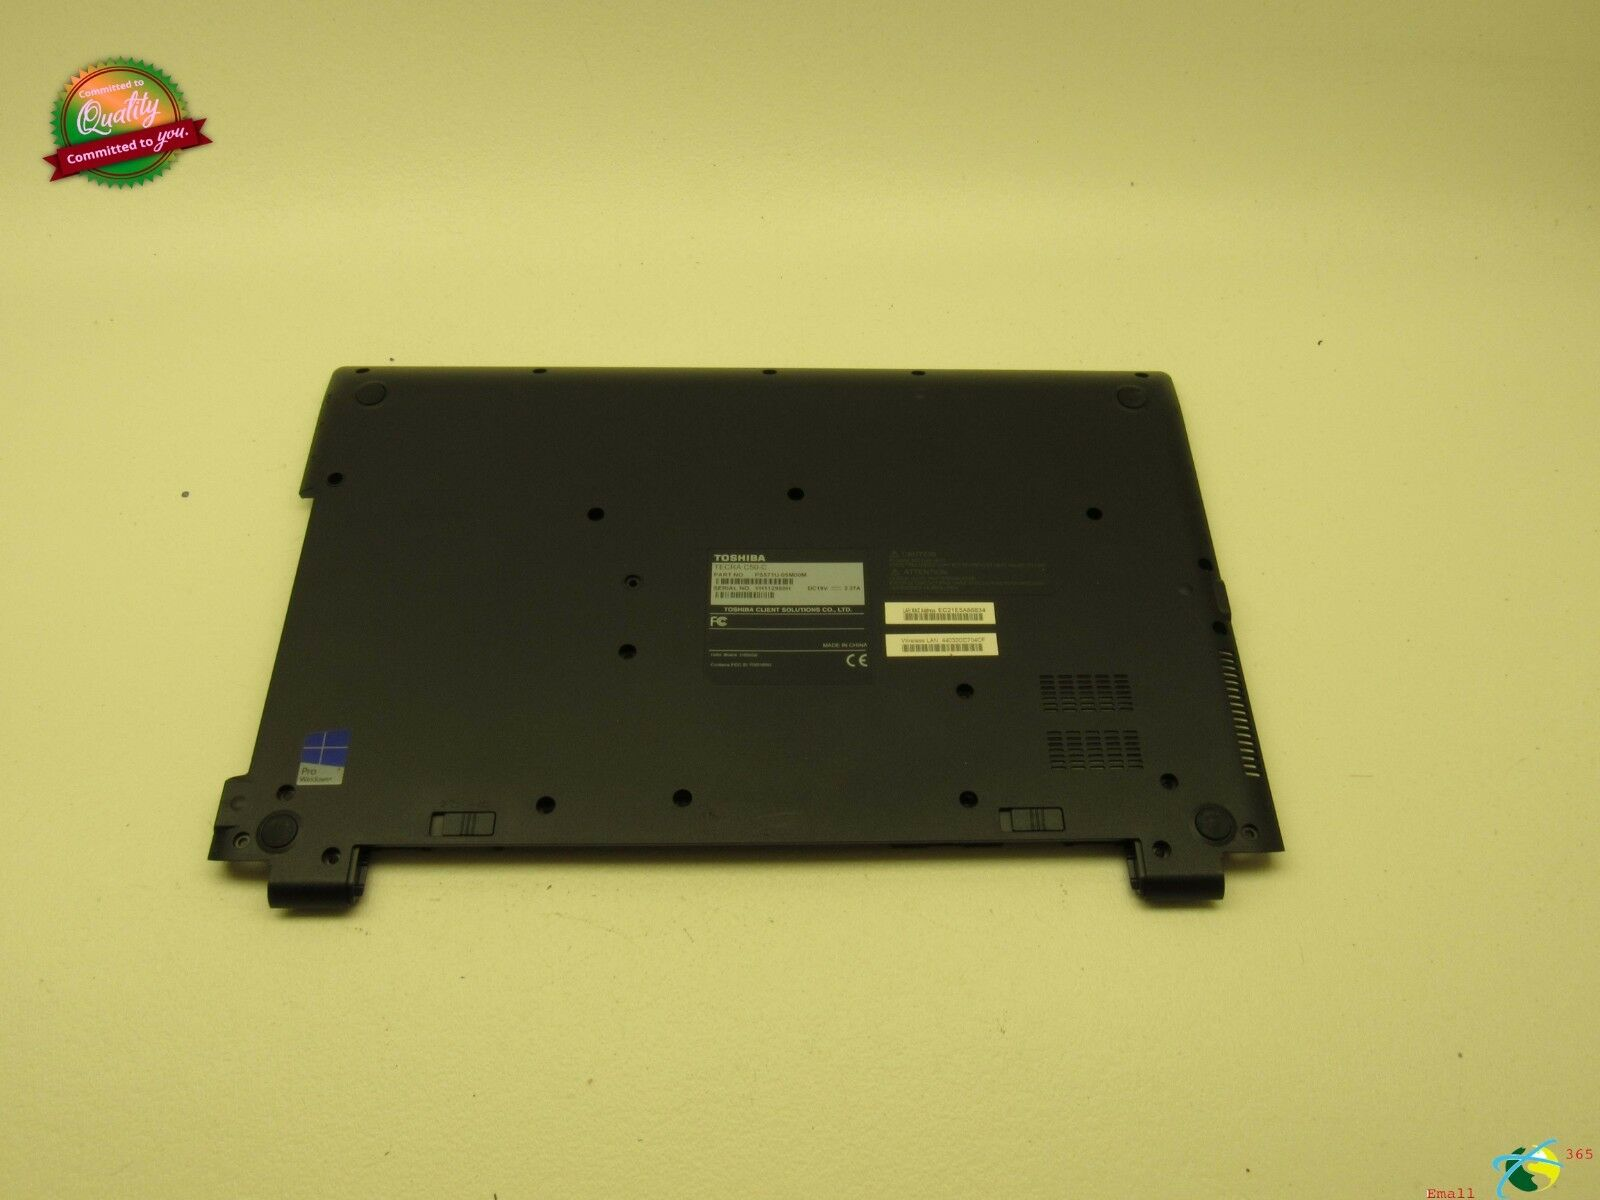 Mouse 7in1 HUB Bundle for Toshiba Tecra Z50 Tecra A50 3in1 Bag Tecra C50